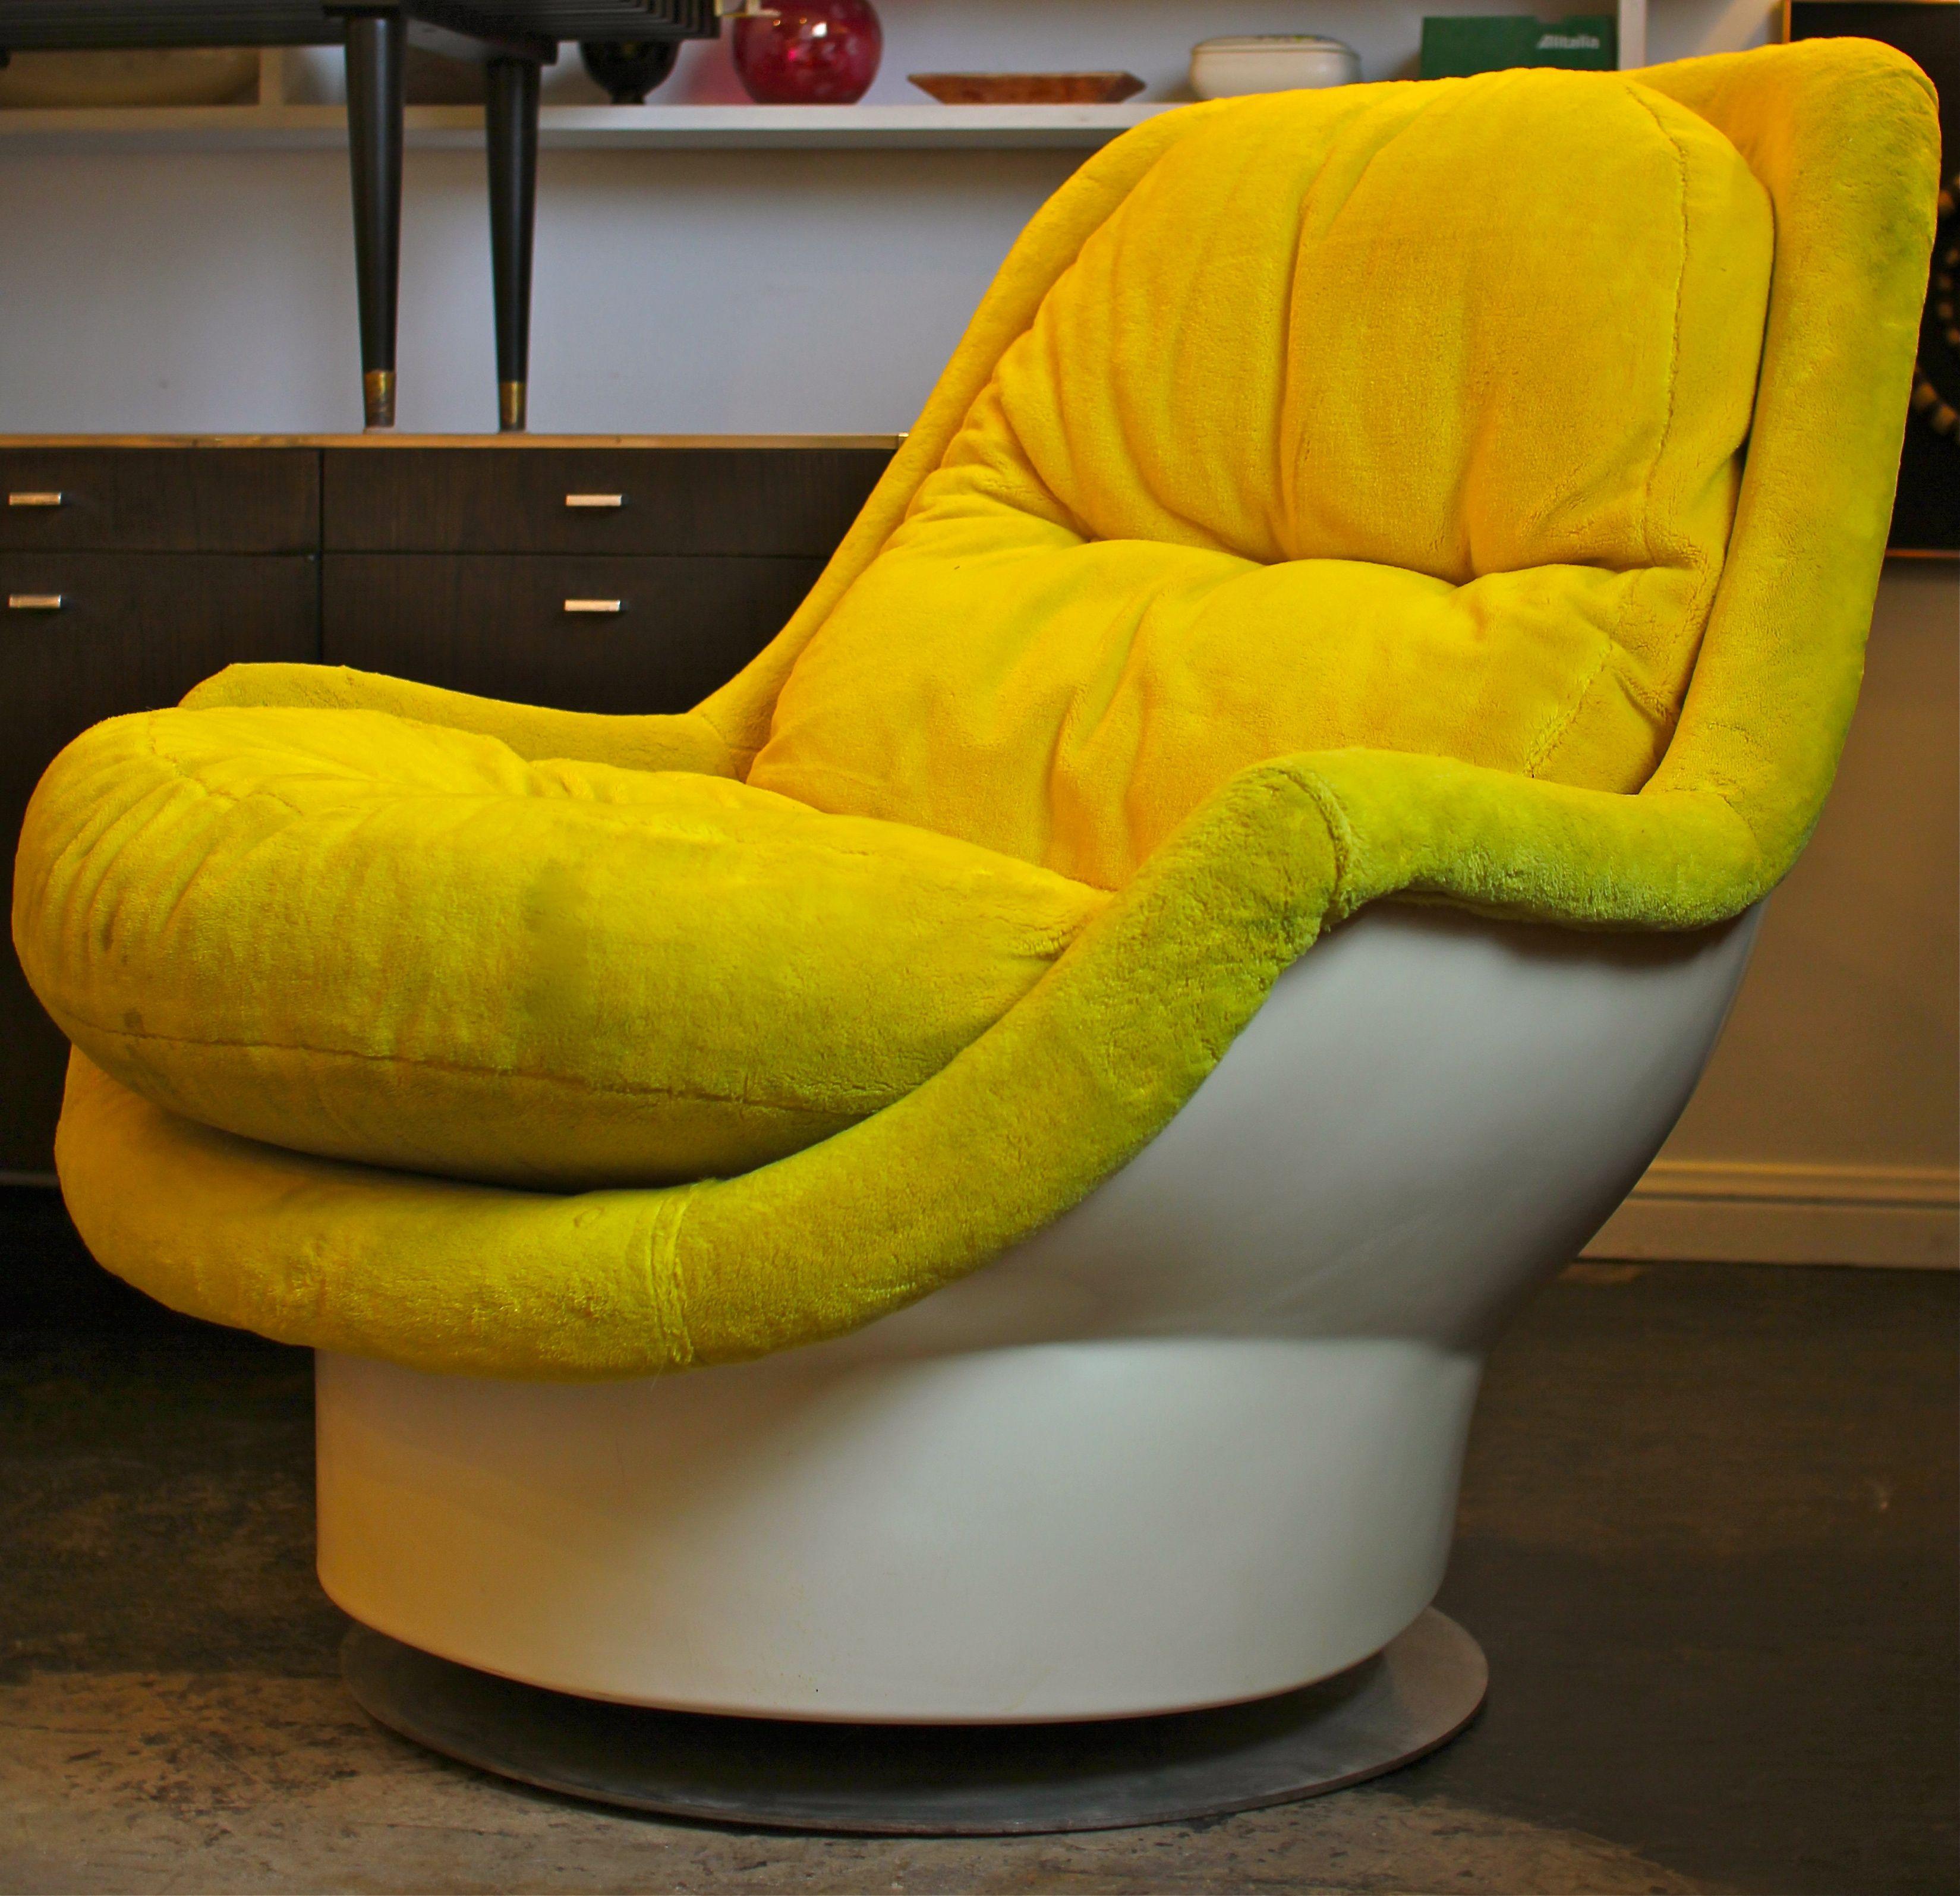 Chromcraft Space Age Furniture | Fiberglass Lounge Chair by Milo ...